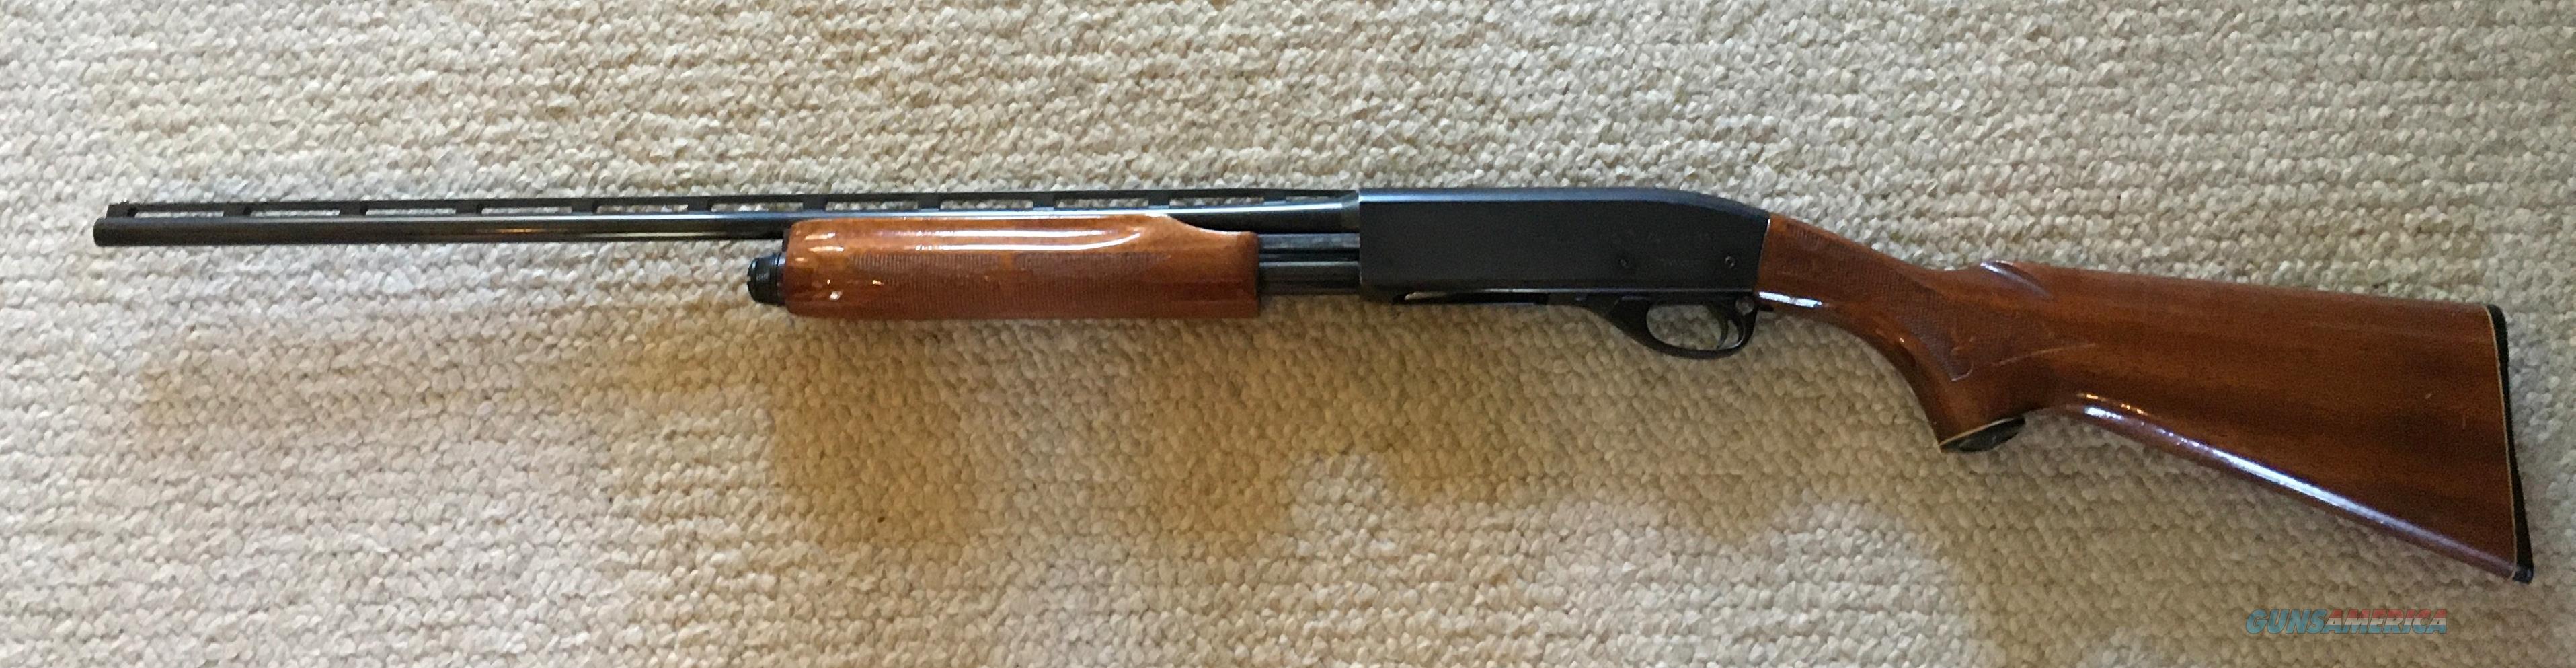 Remington 870 Wingmaster .410  Guns > Shotguns > Remington Shotguns  > Pump > Hunting